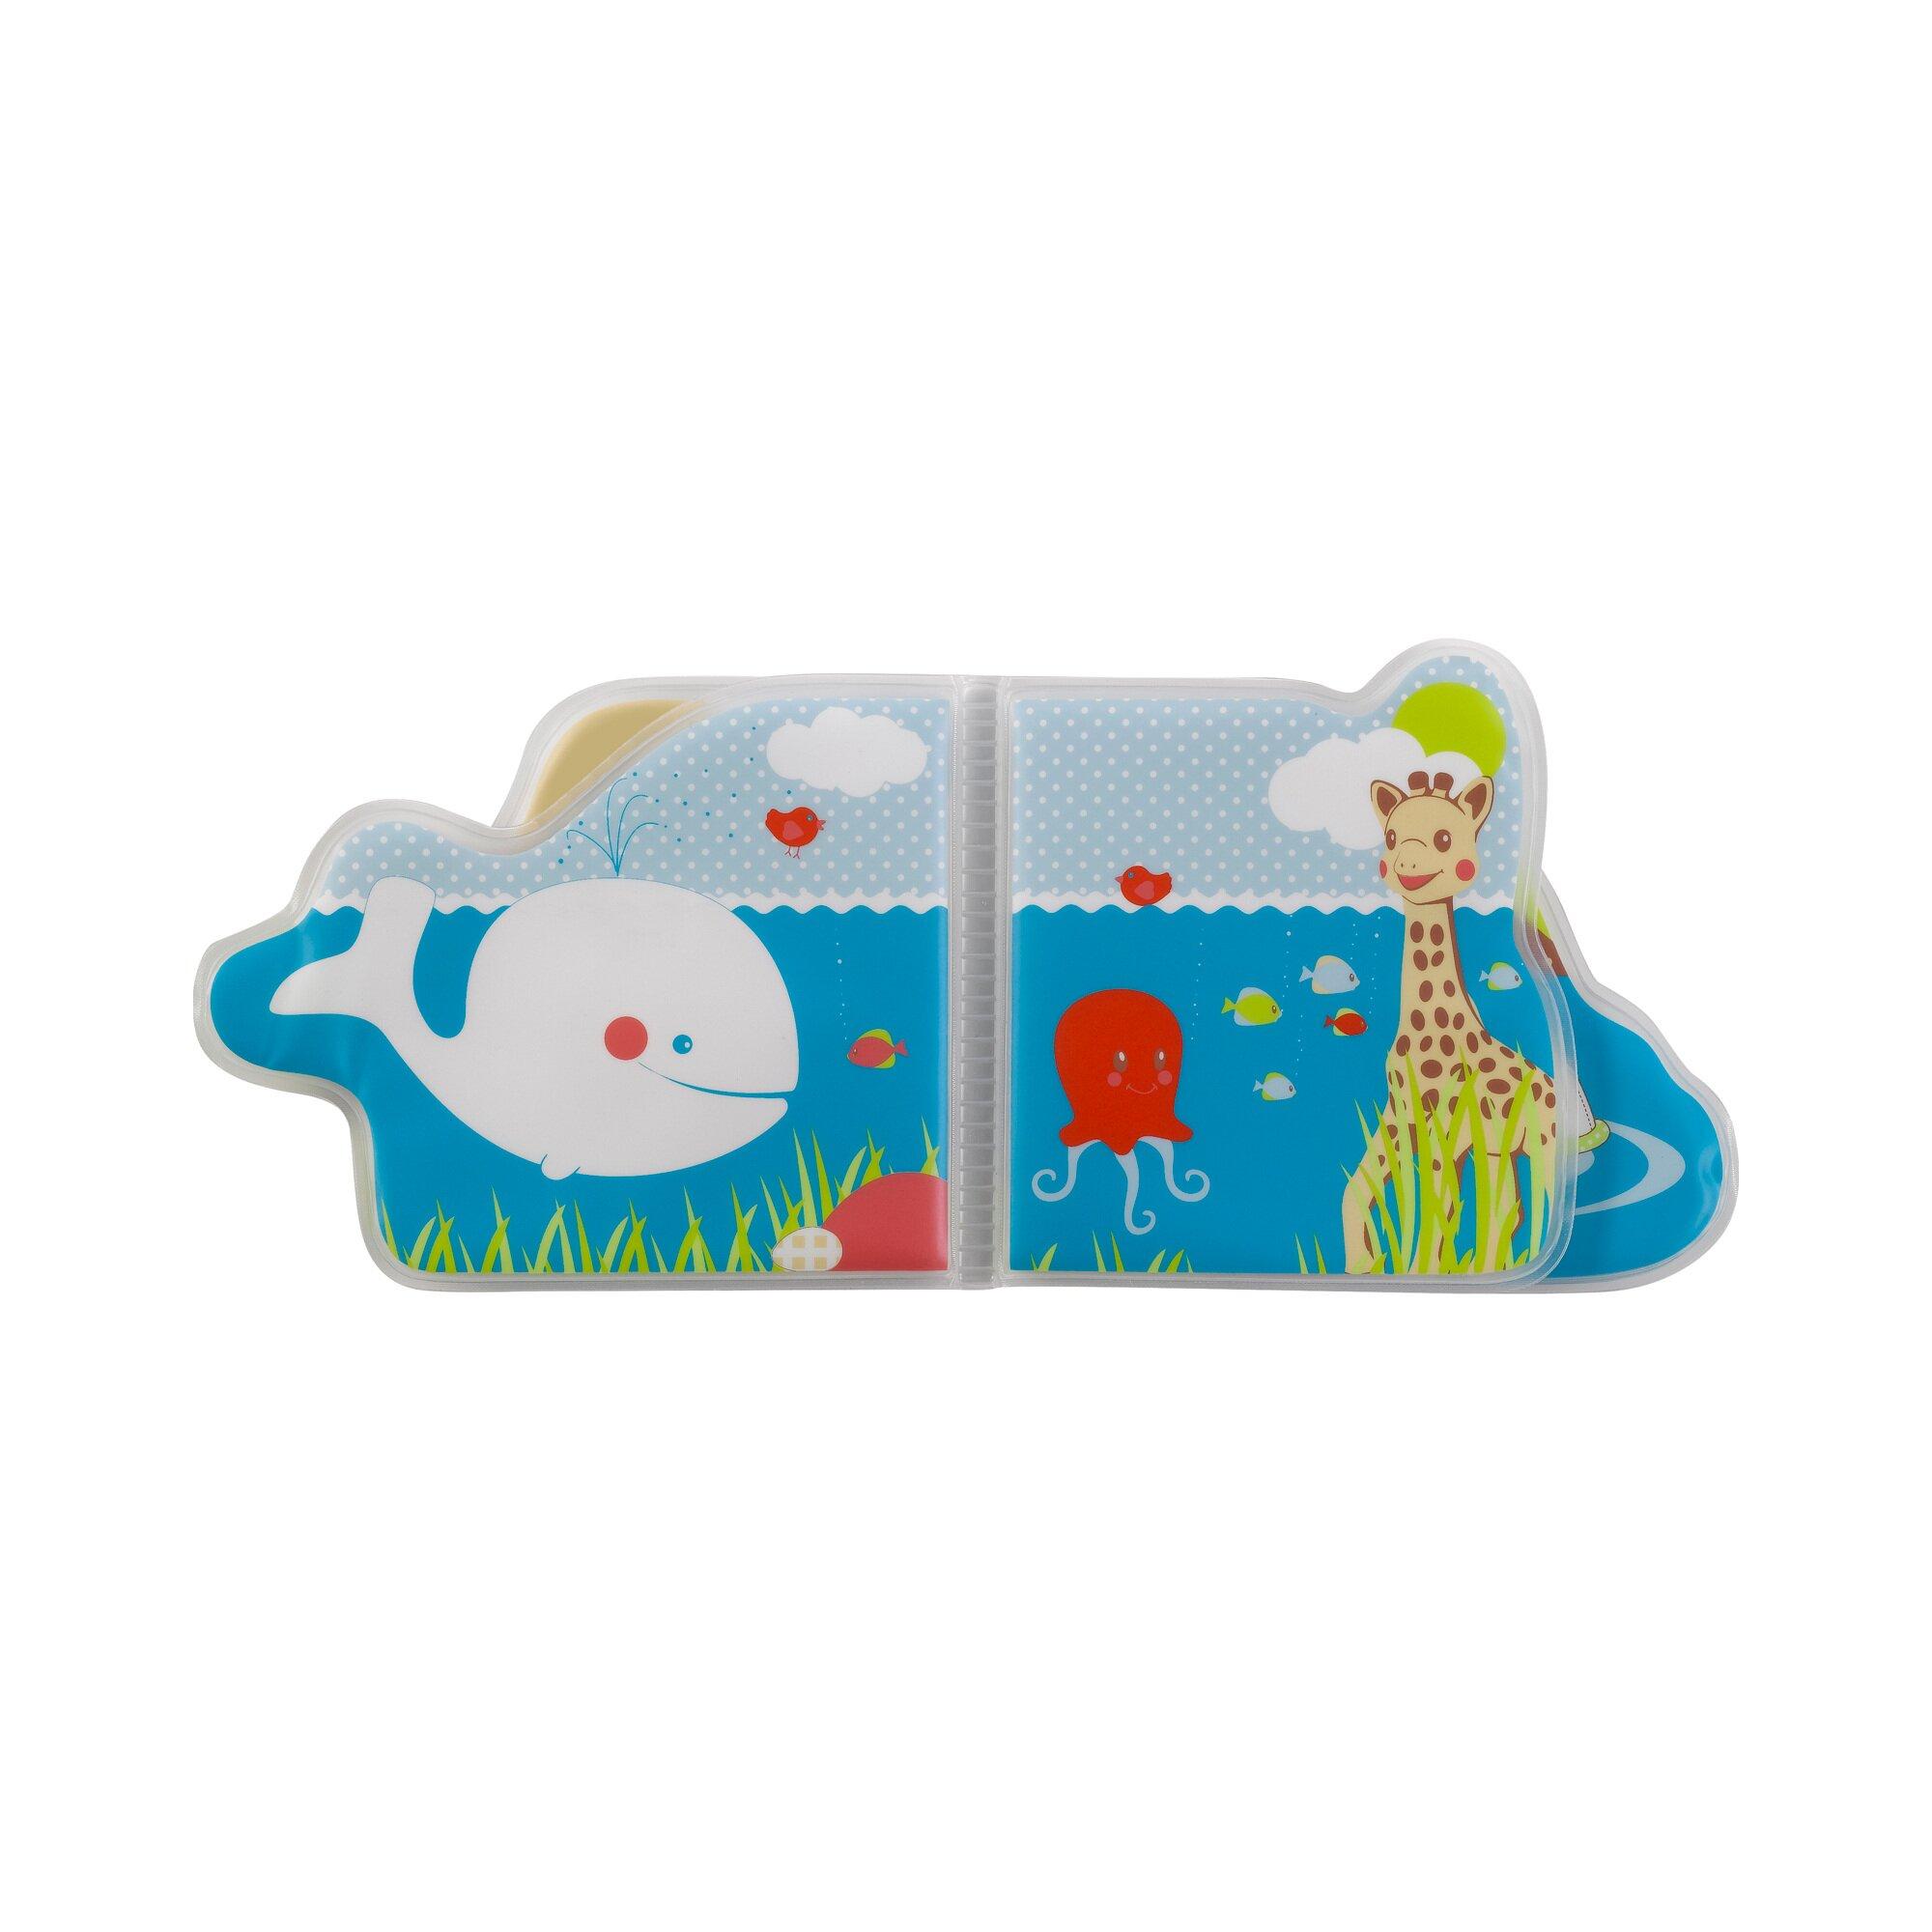 sophie-la-girafe-badespielzeug-badebuch-